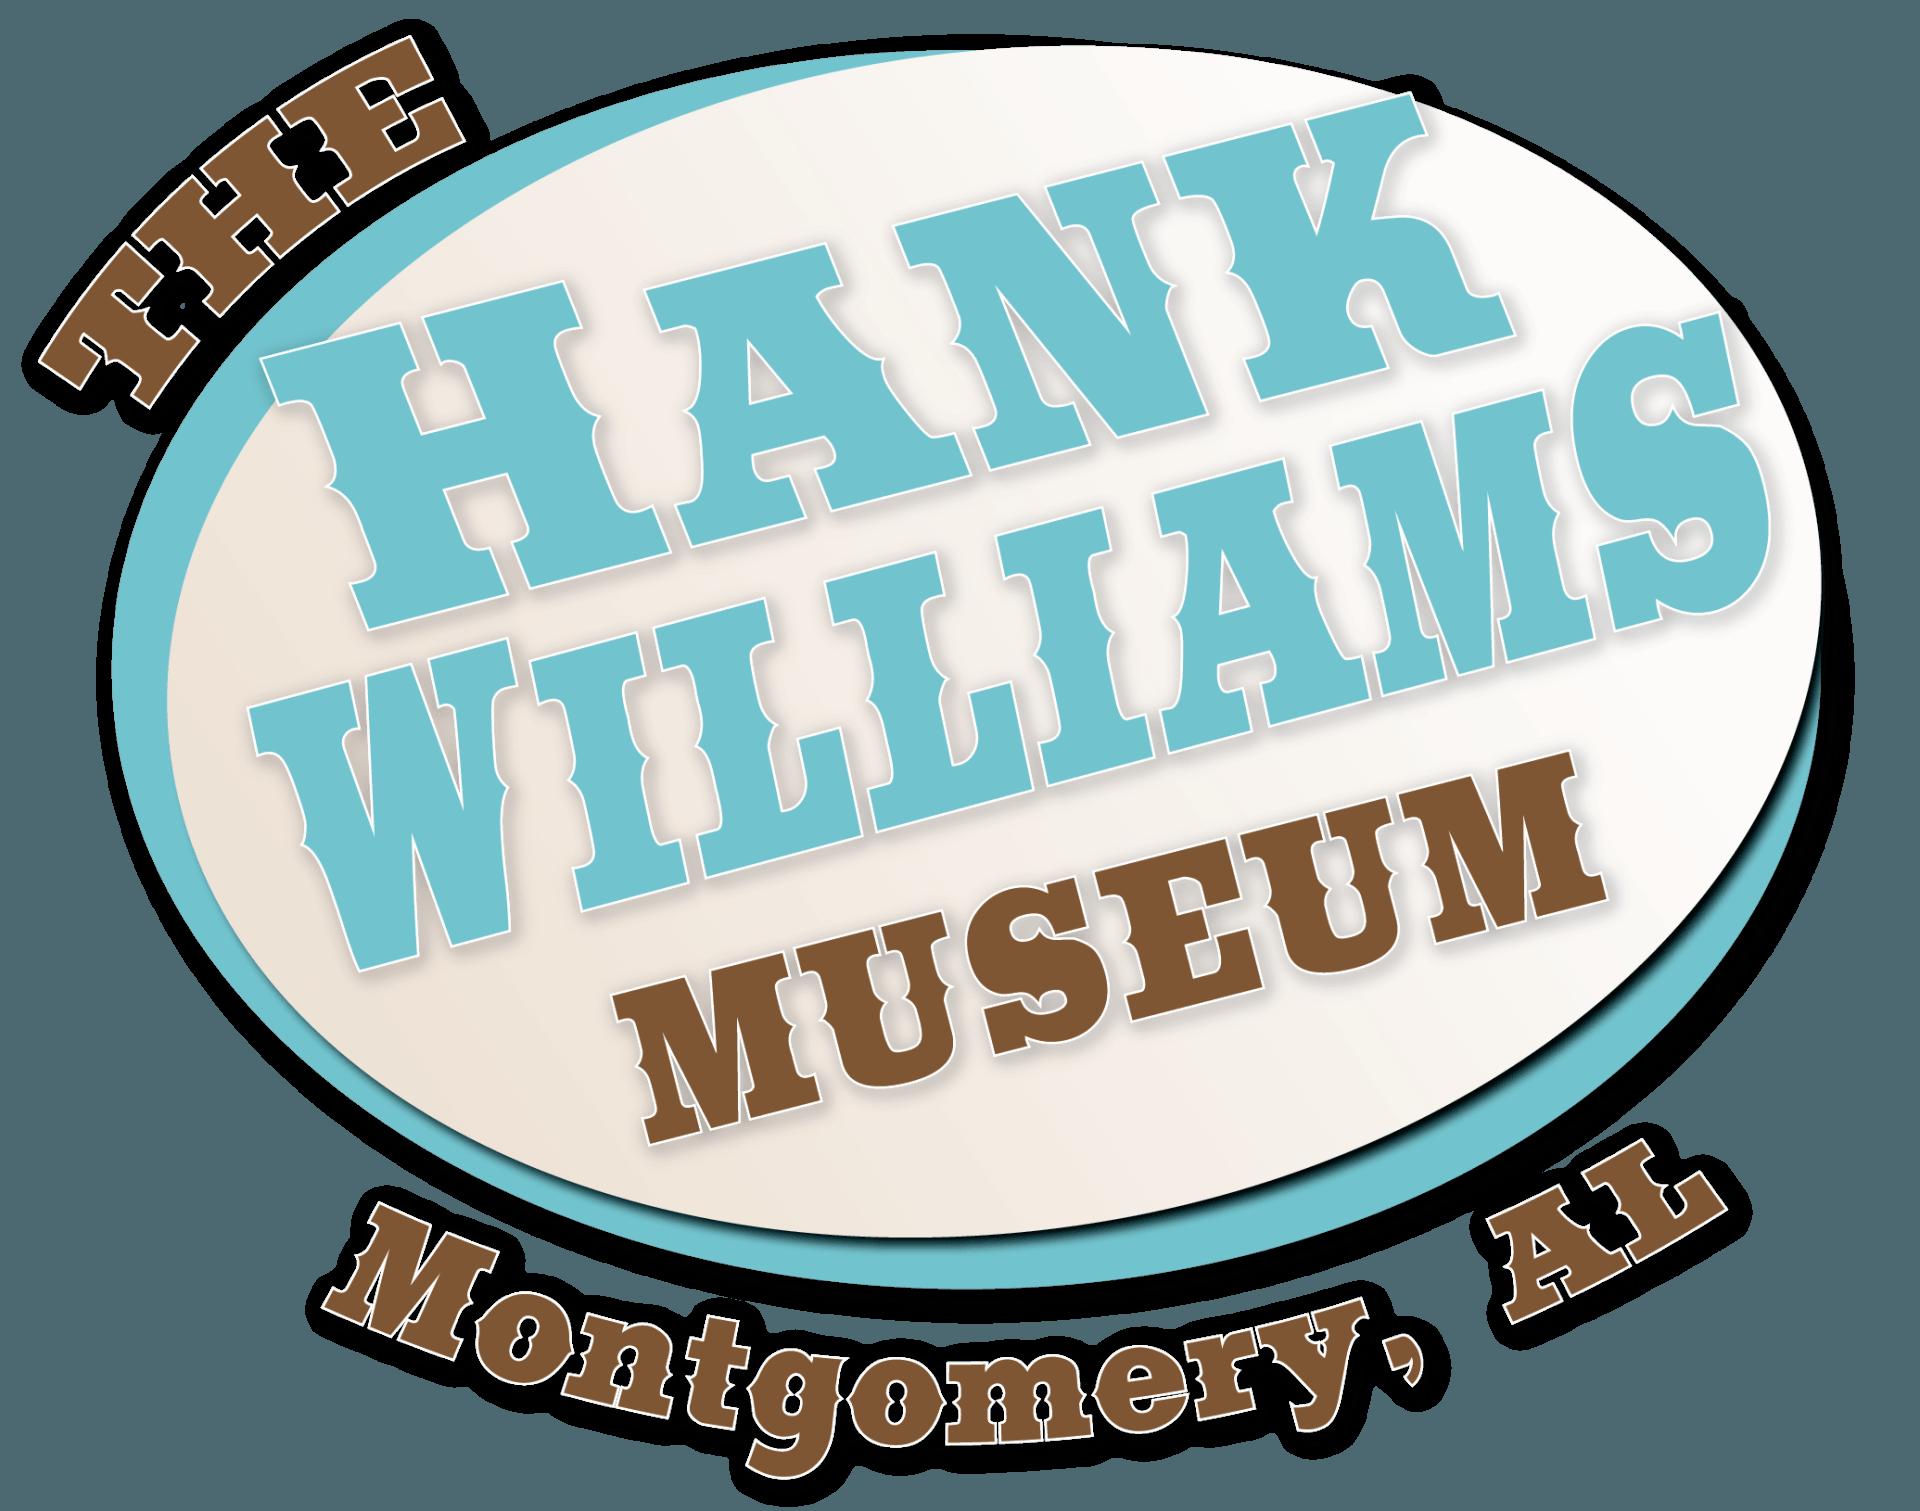 www.thehankwilliamsmuseum.net